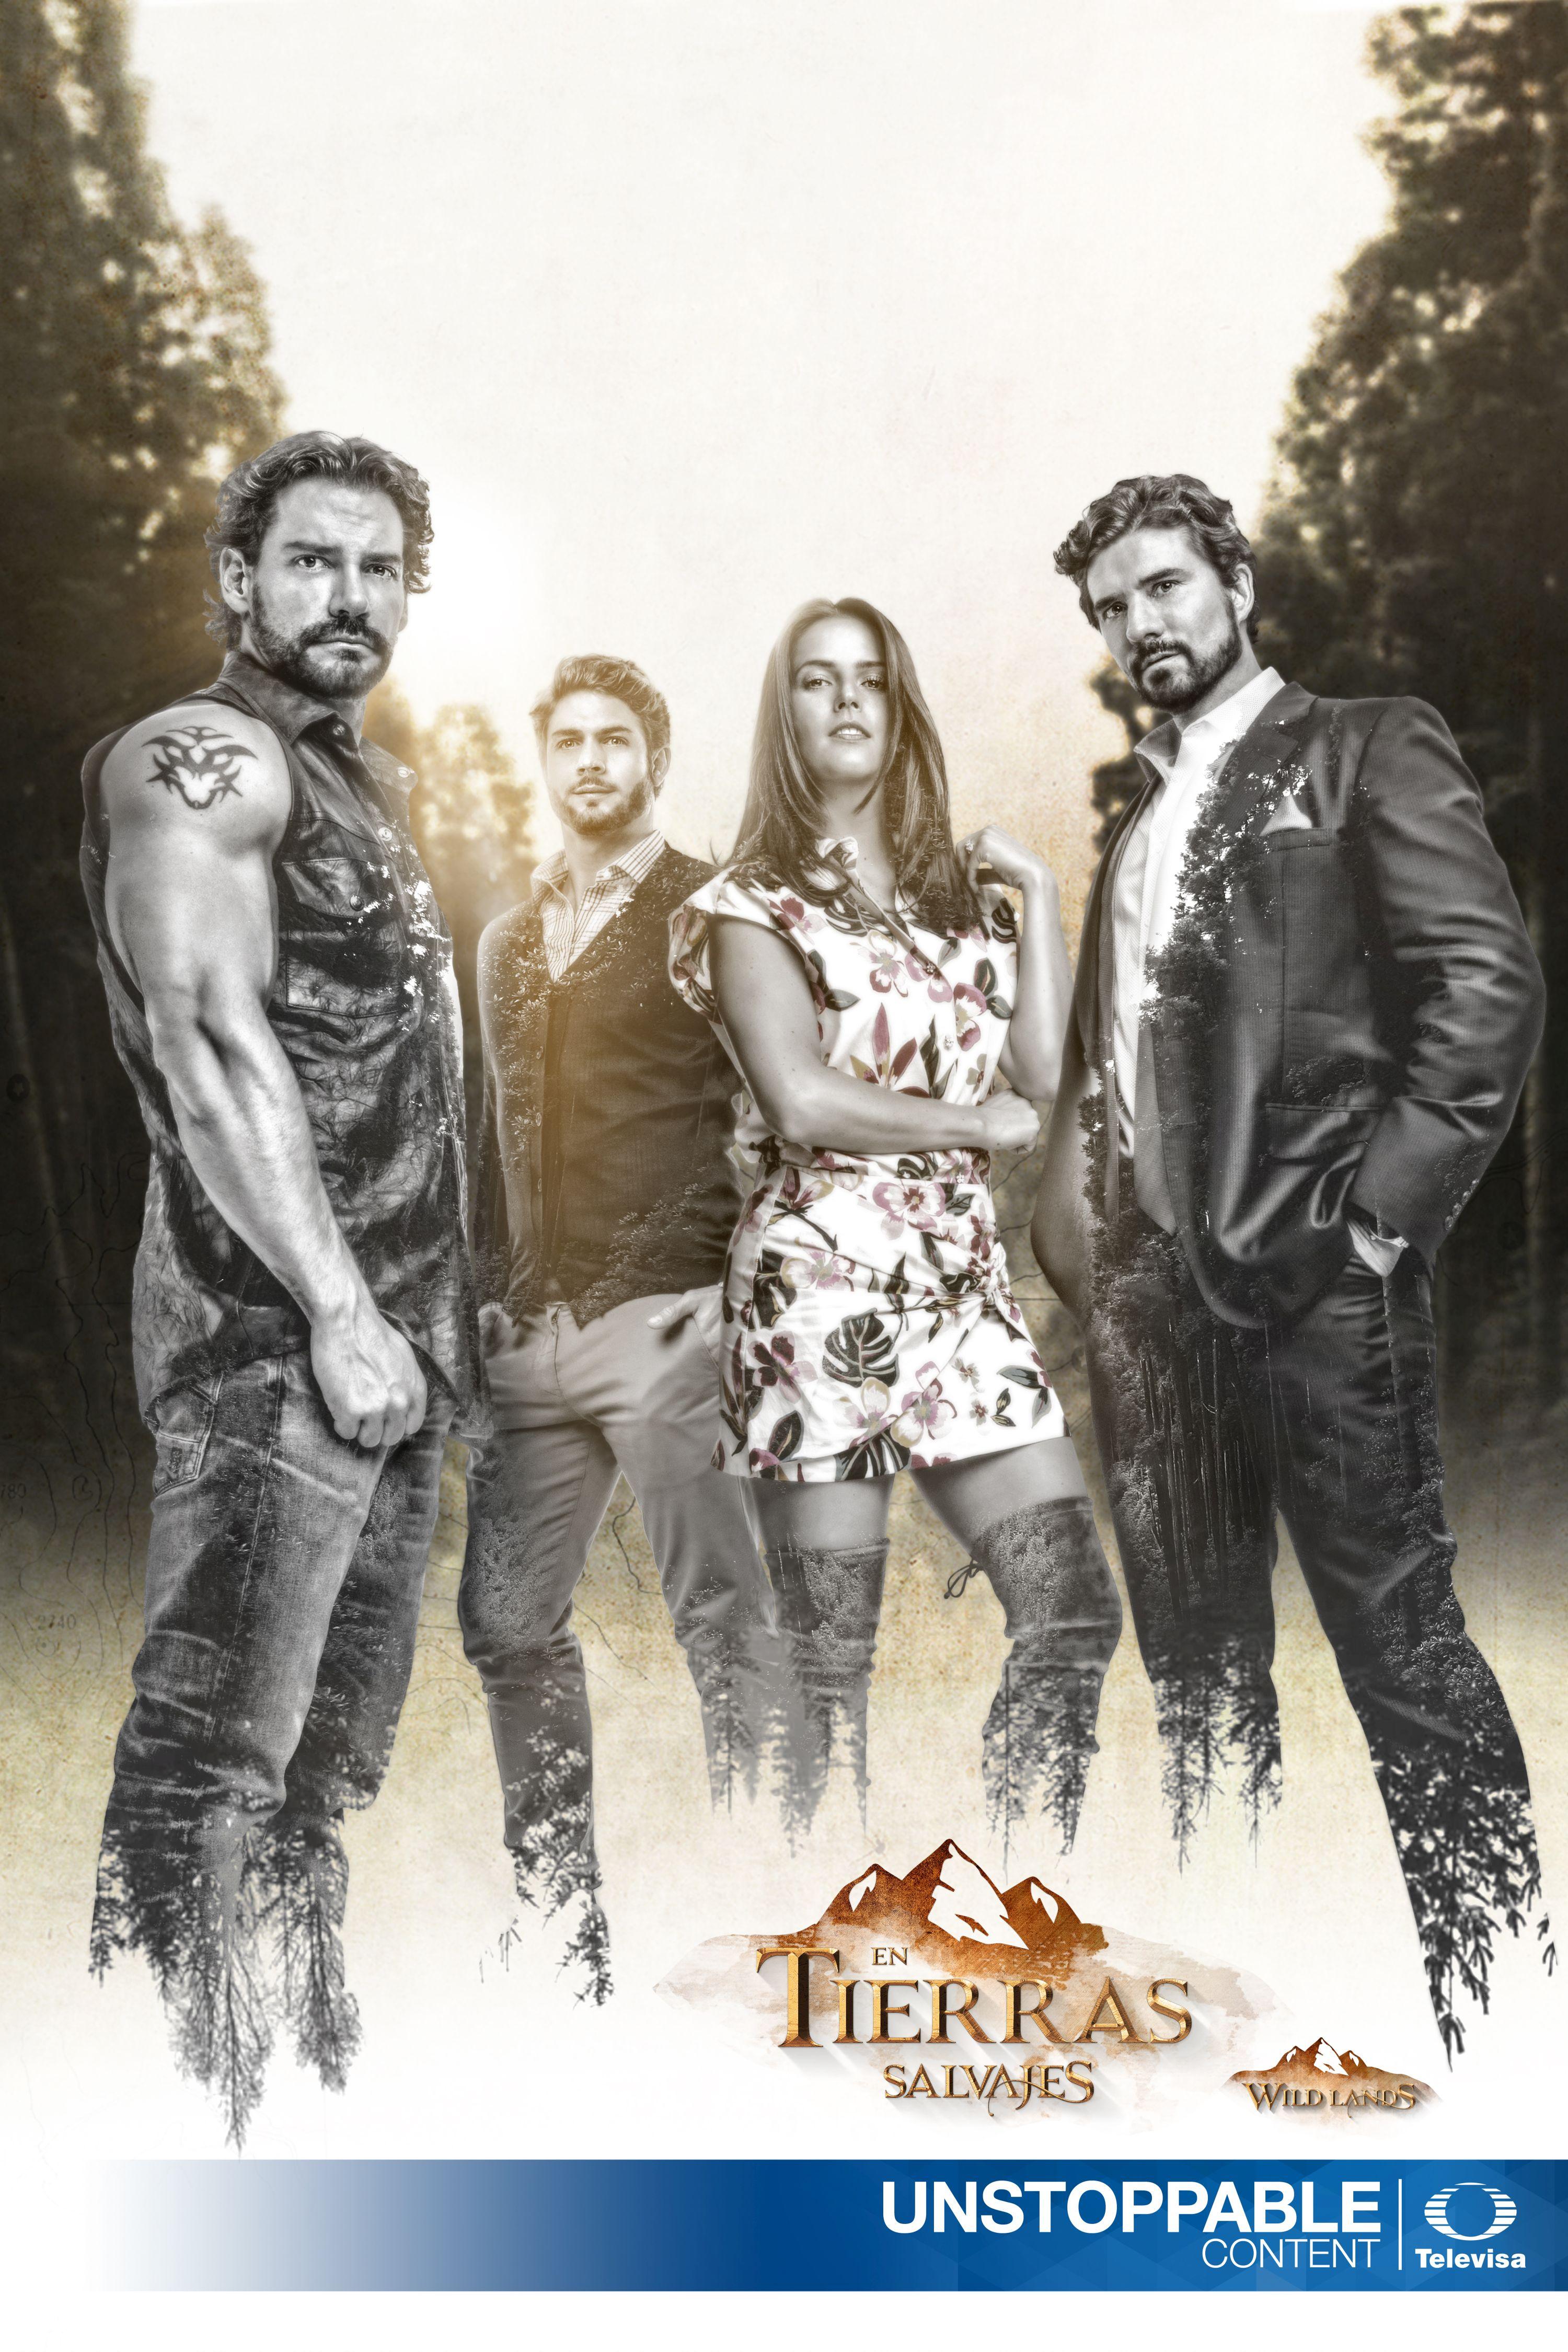 En tierras salvajes (TV Series 2017) - IMDb